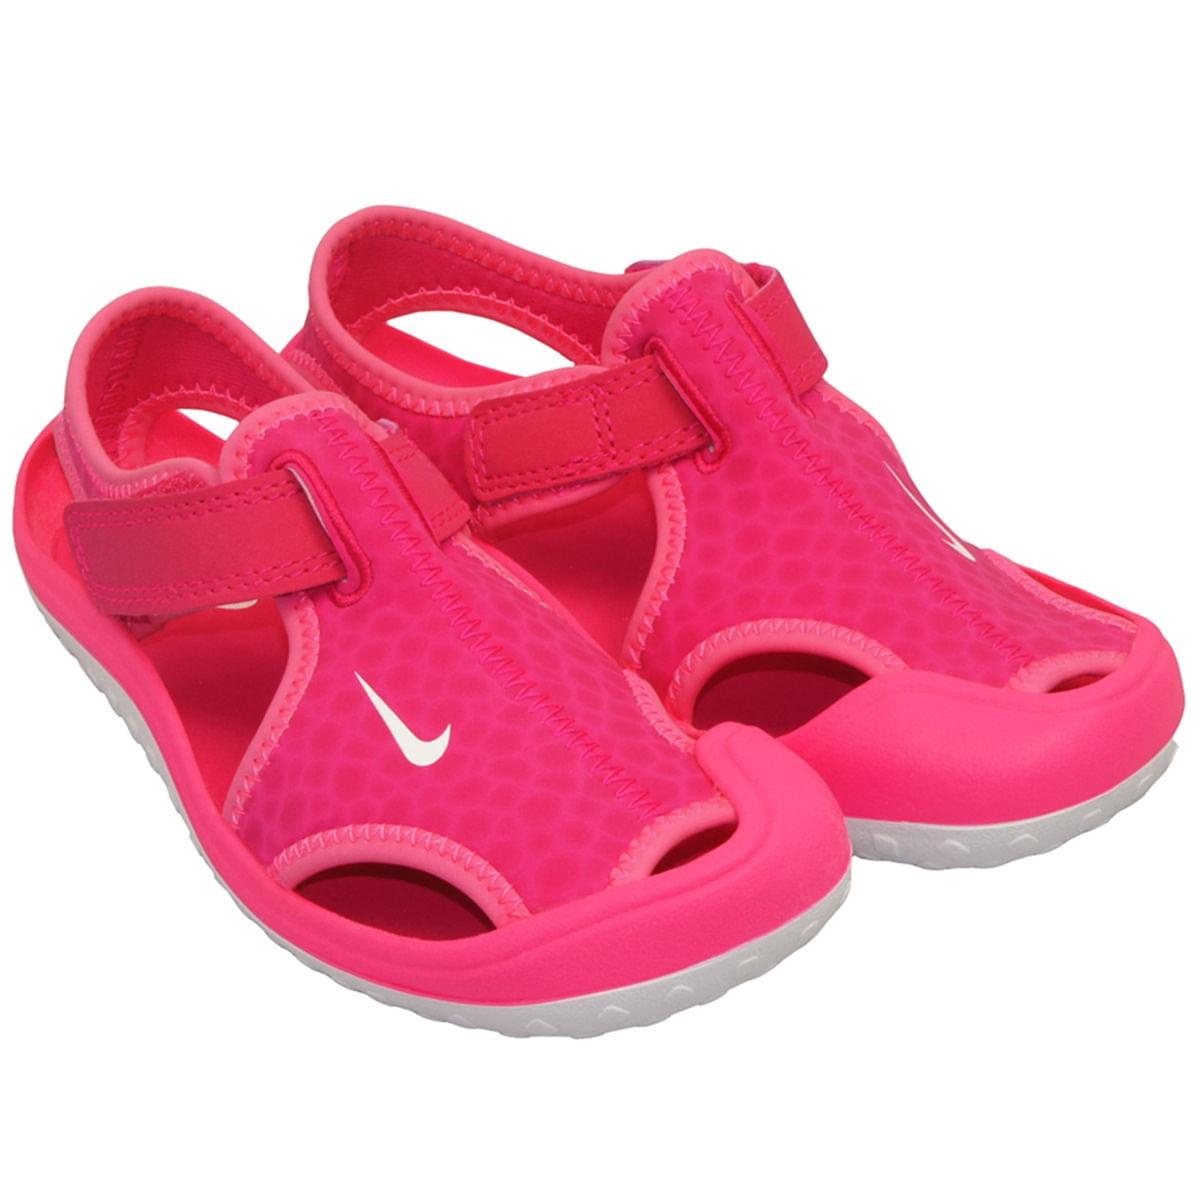 Sandalia-Infantil-Nike-Sunray-Protect--TD---175-ao-26-